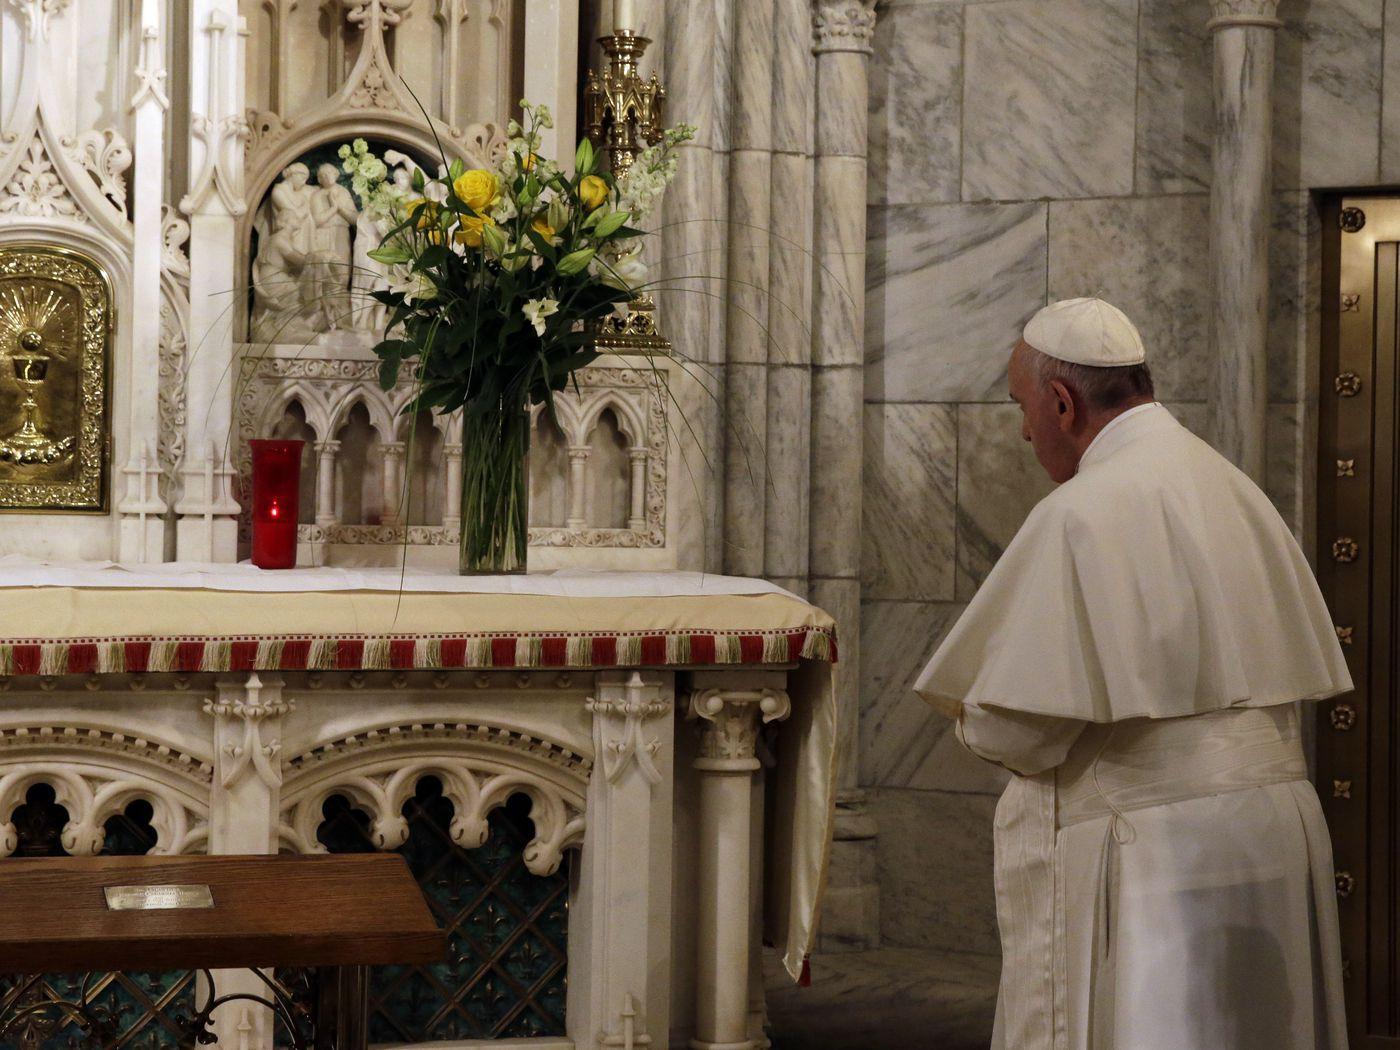 The Catholic priest child sex abuse crisis, explained - Vox